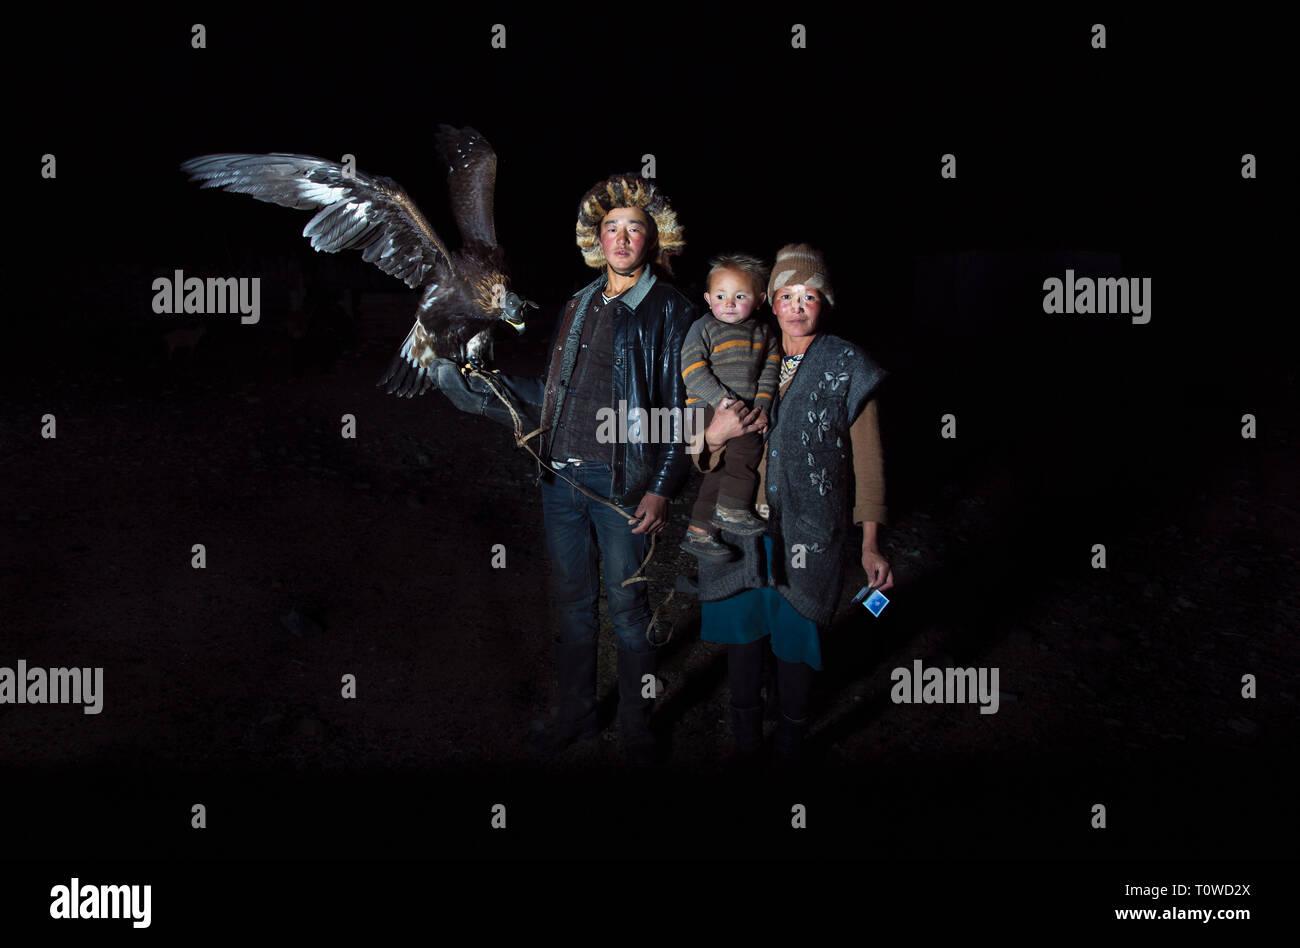 bayan Ulgii, Mongolia, 30th September 2015: family of mongolian kazakh eagle hunters at night Stock Photo